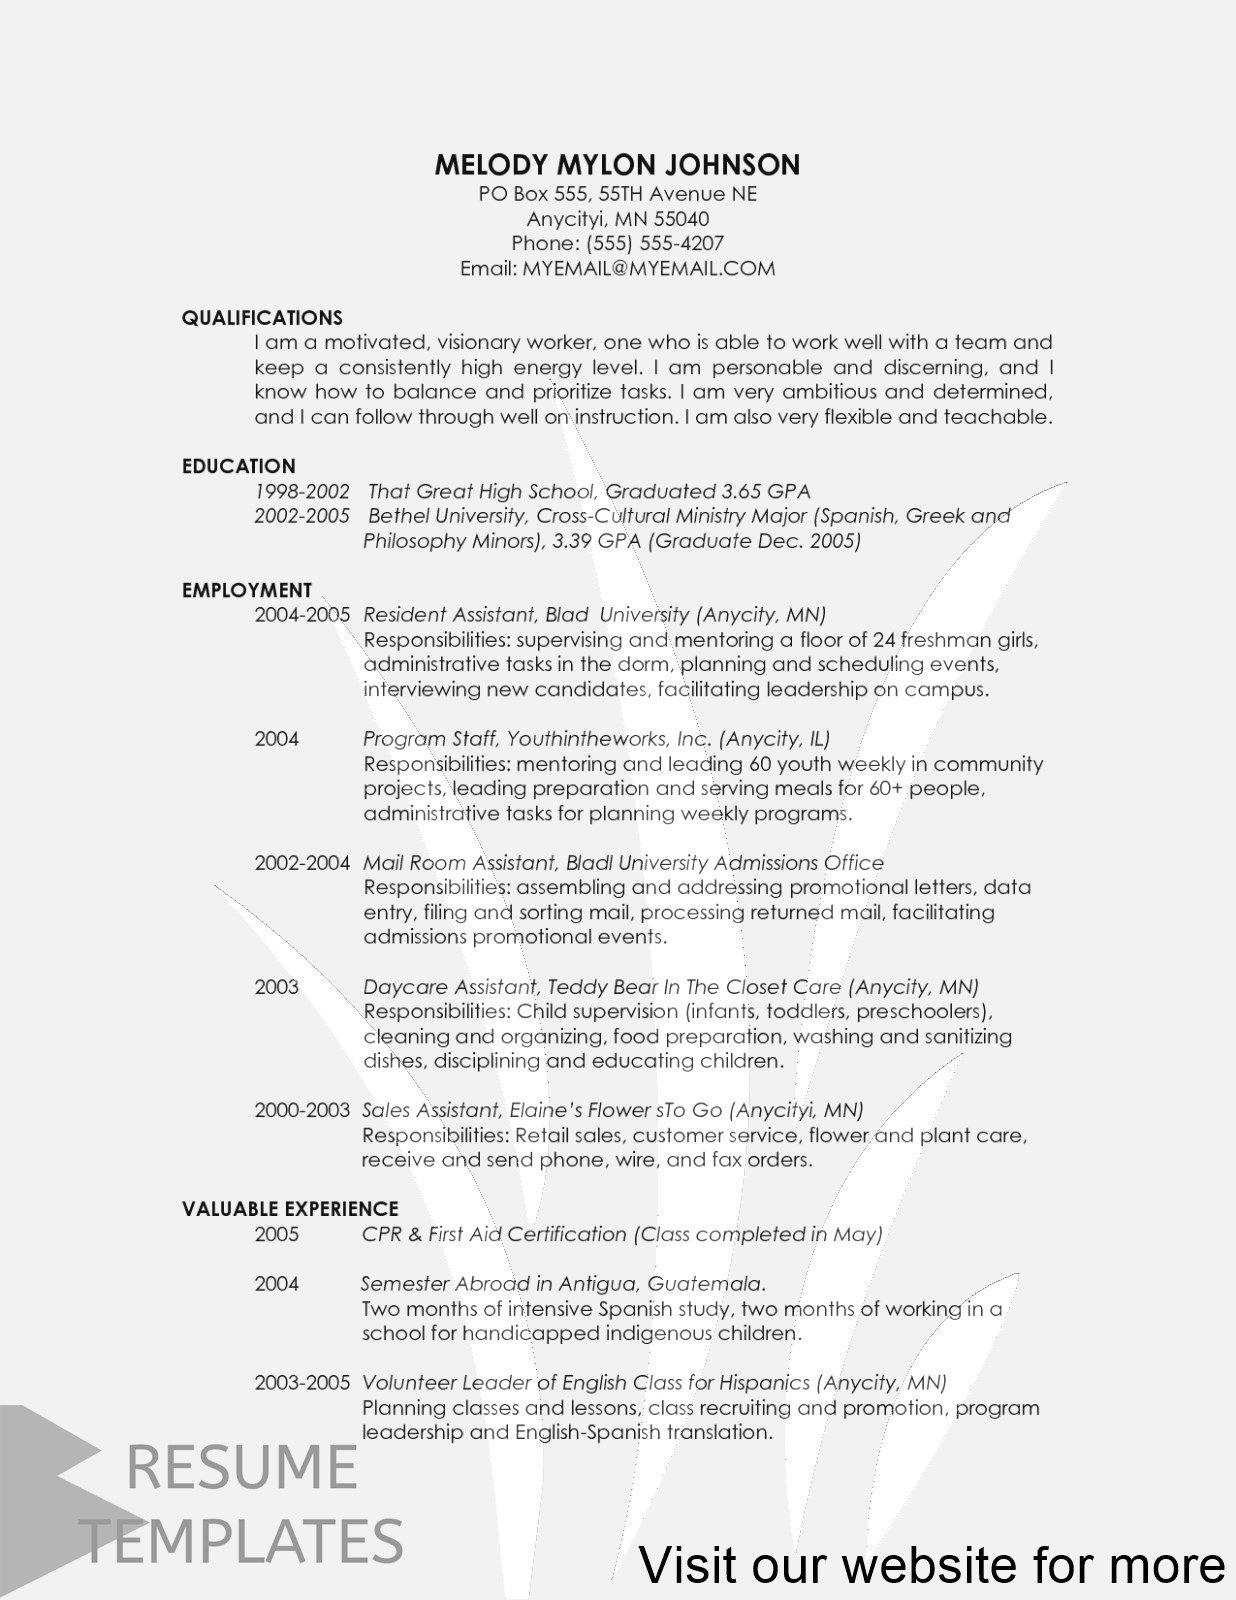 Resume Template College Freshman Professional Freshman College Resume Template Professional Resume Template